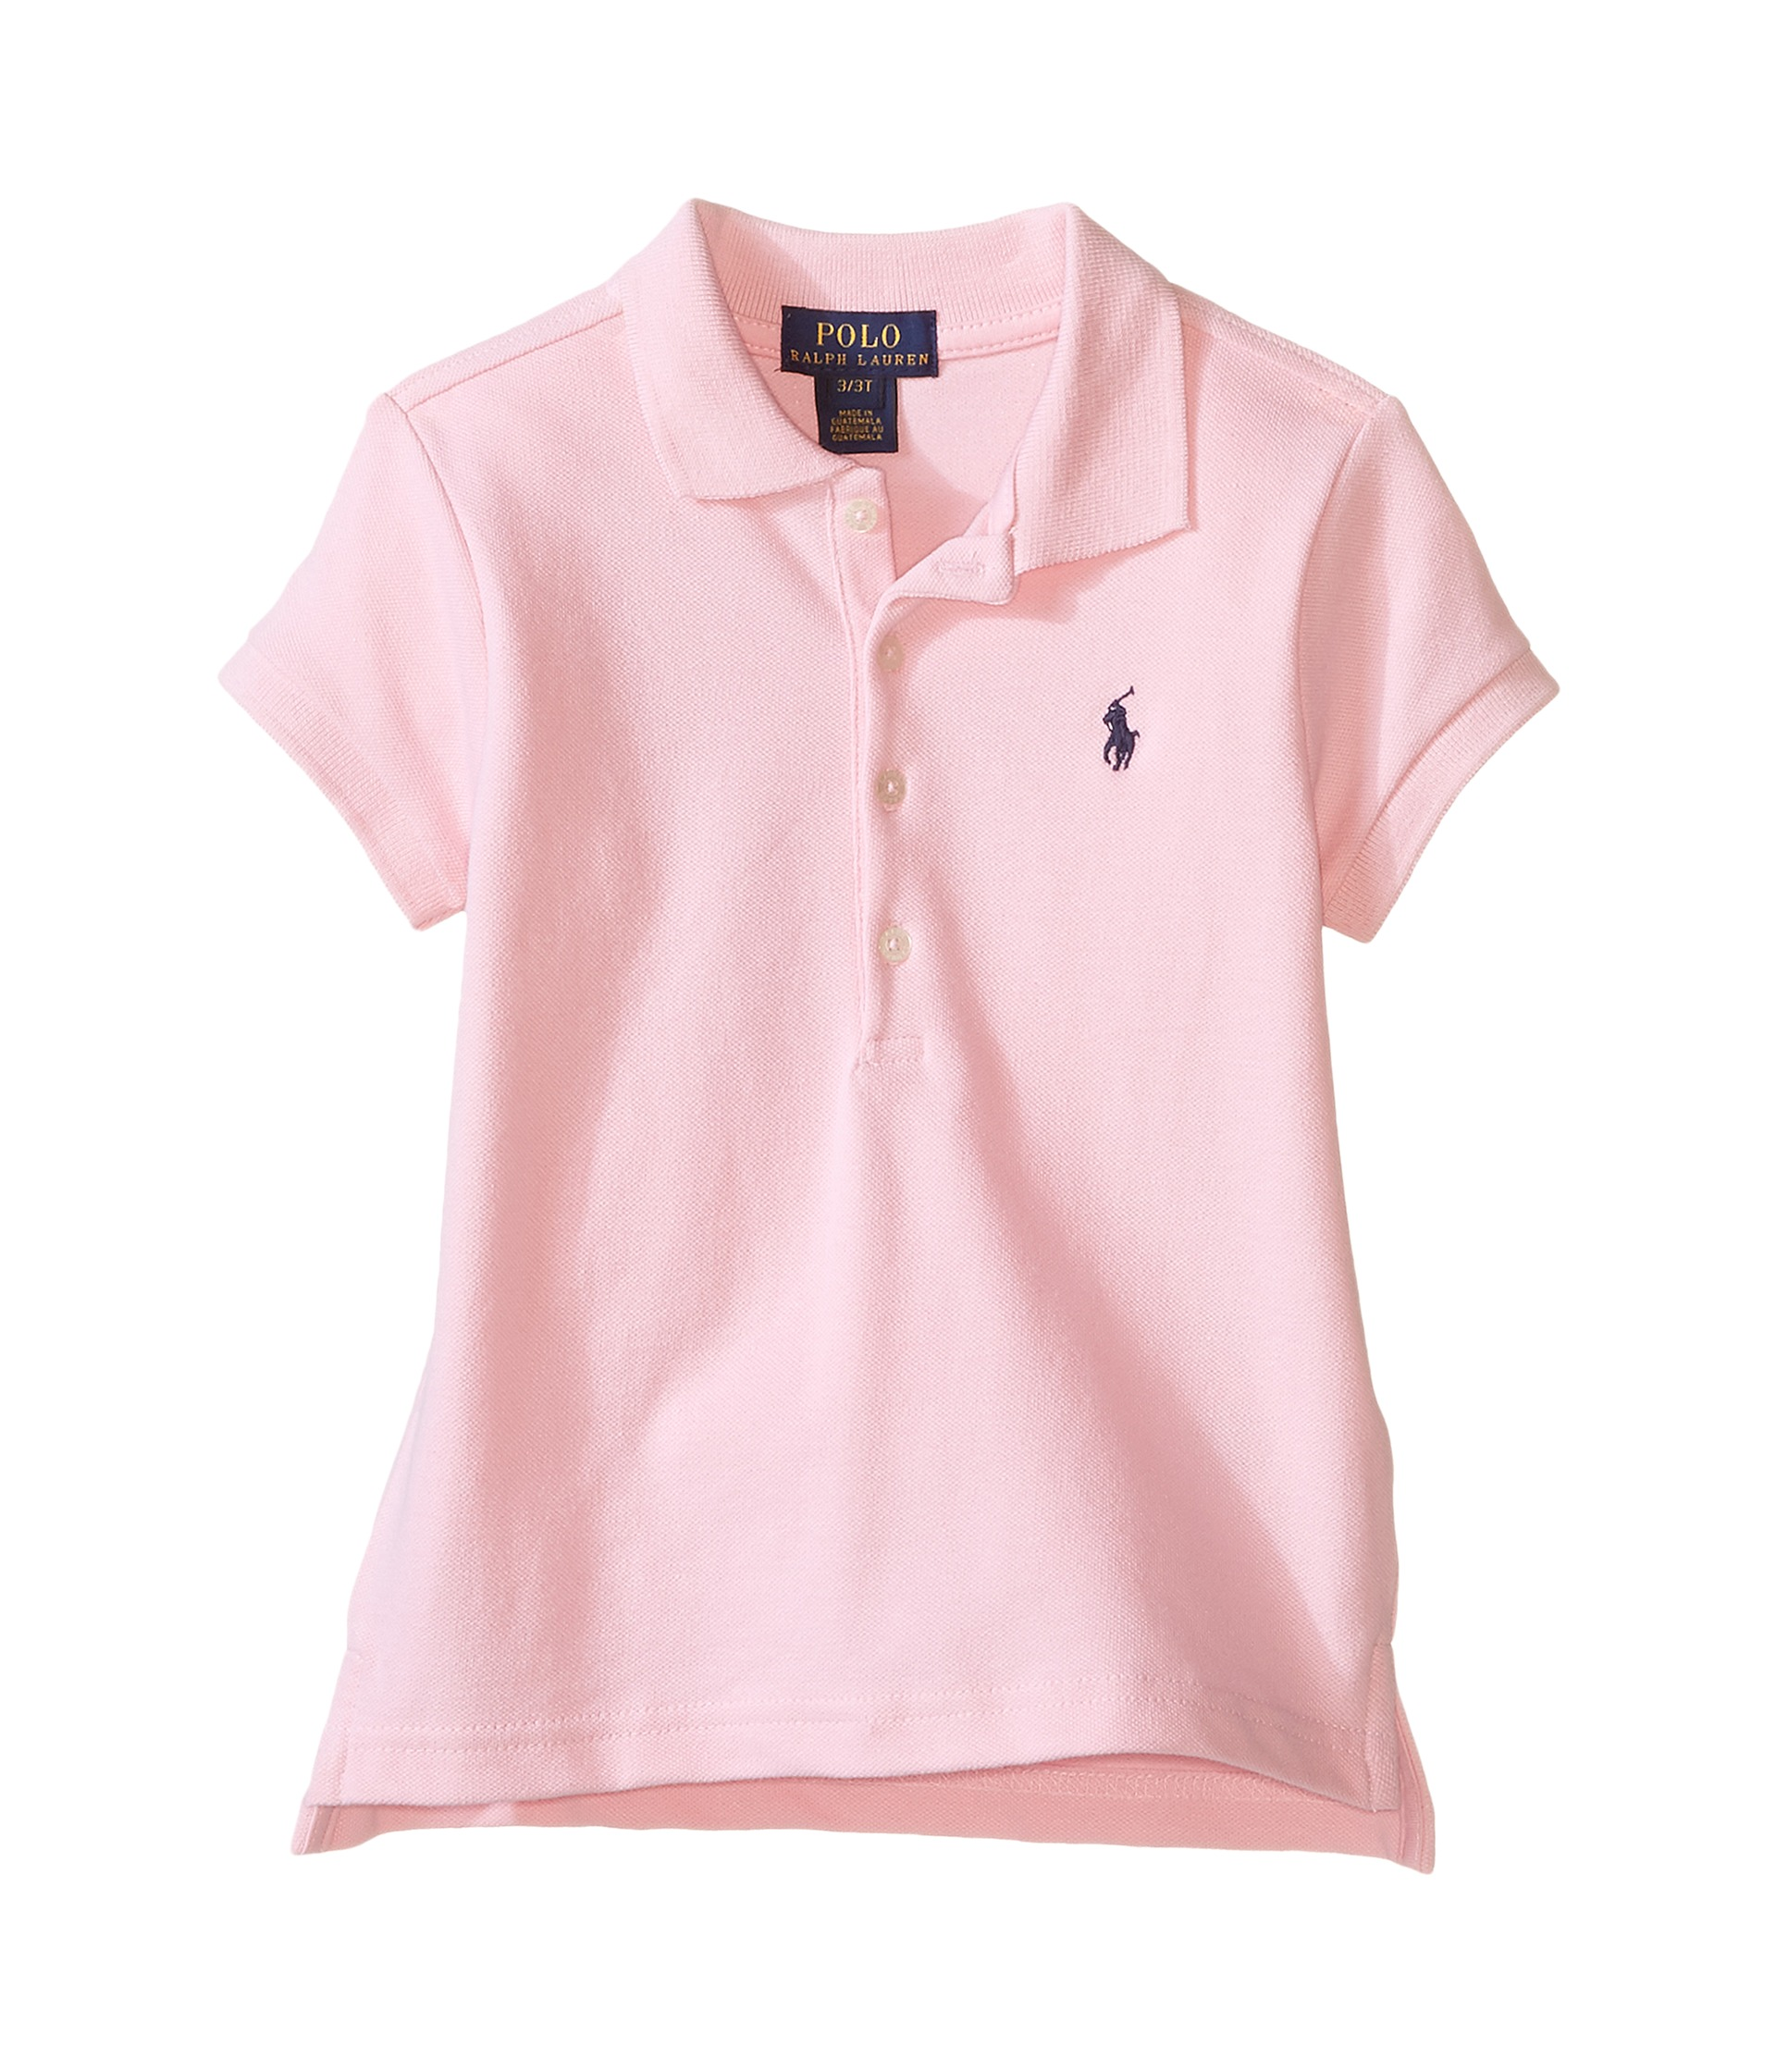 Polo ralph lauren kids short sleeve mesh polo shirt for Baby pink polo shirt